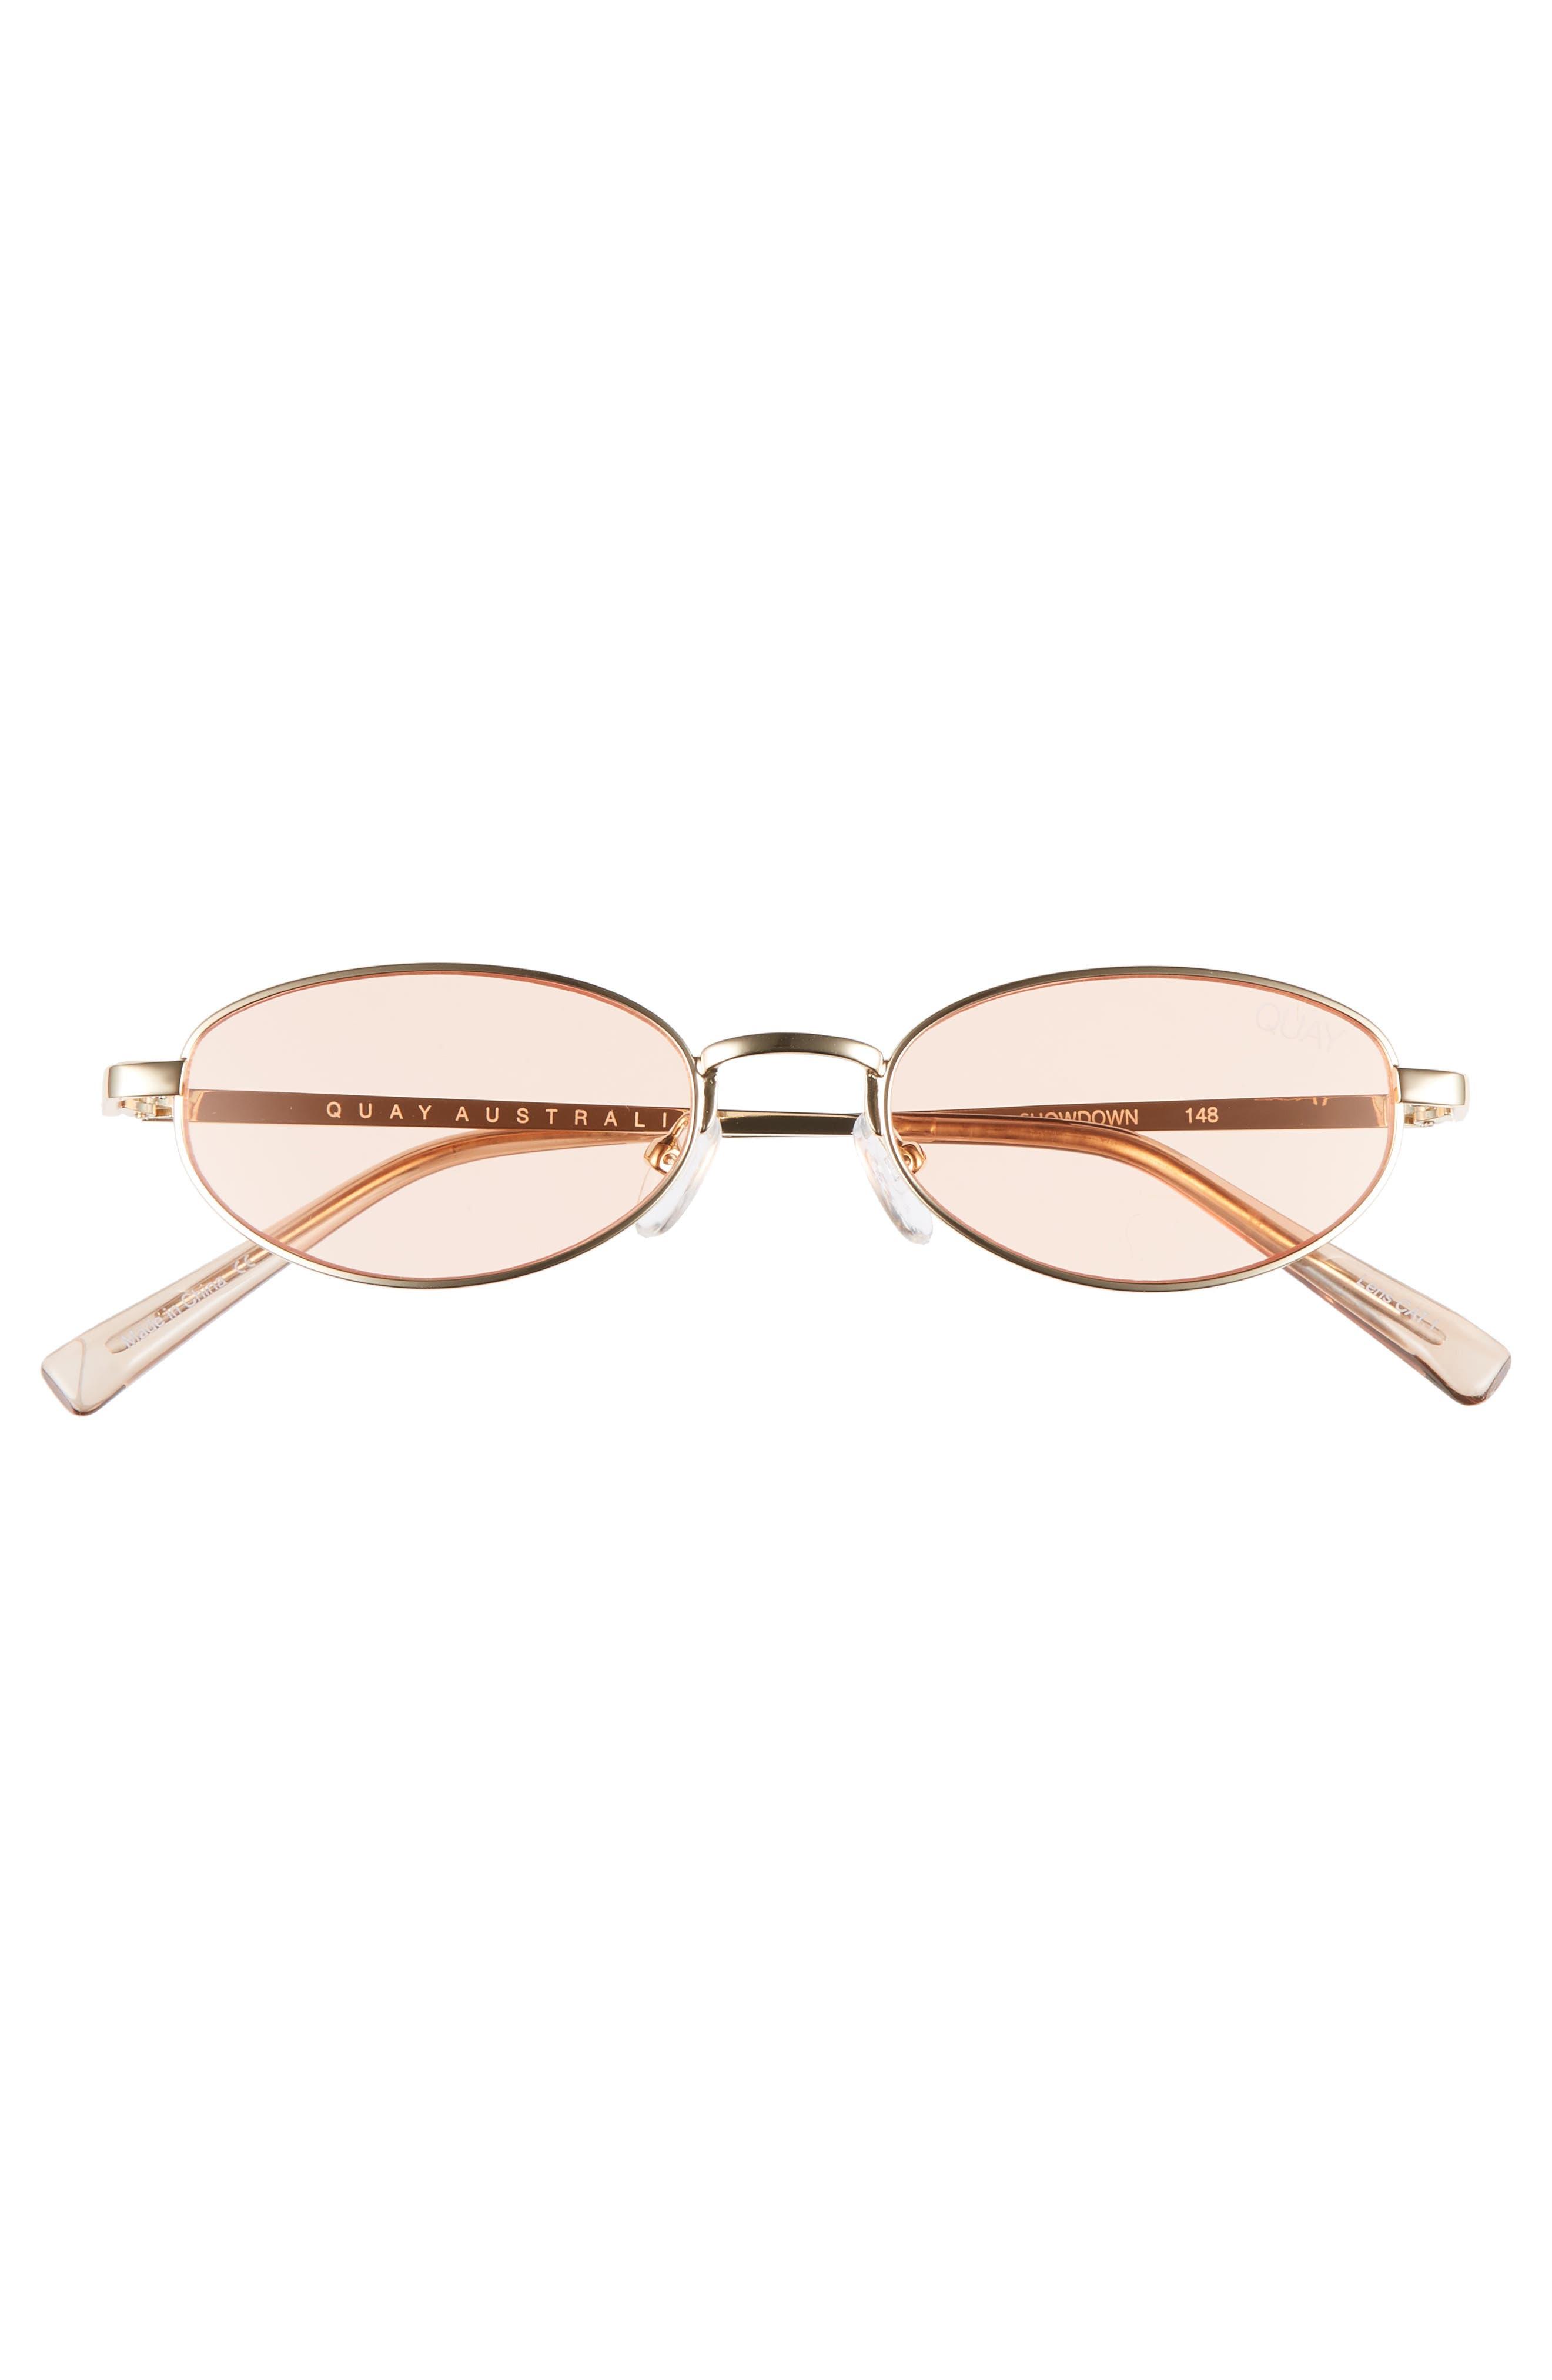 49mm Showdown Oval Sunglasses,                             Alternate thumbnail 3, color,                             GOLD